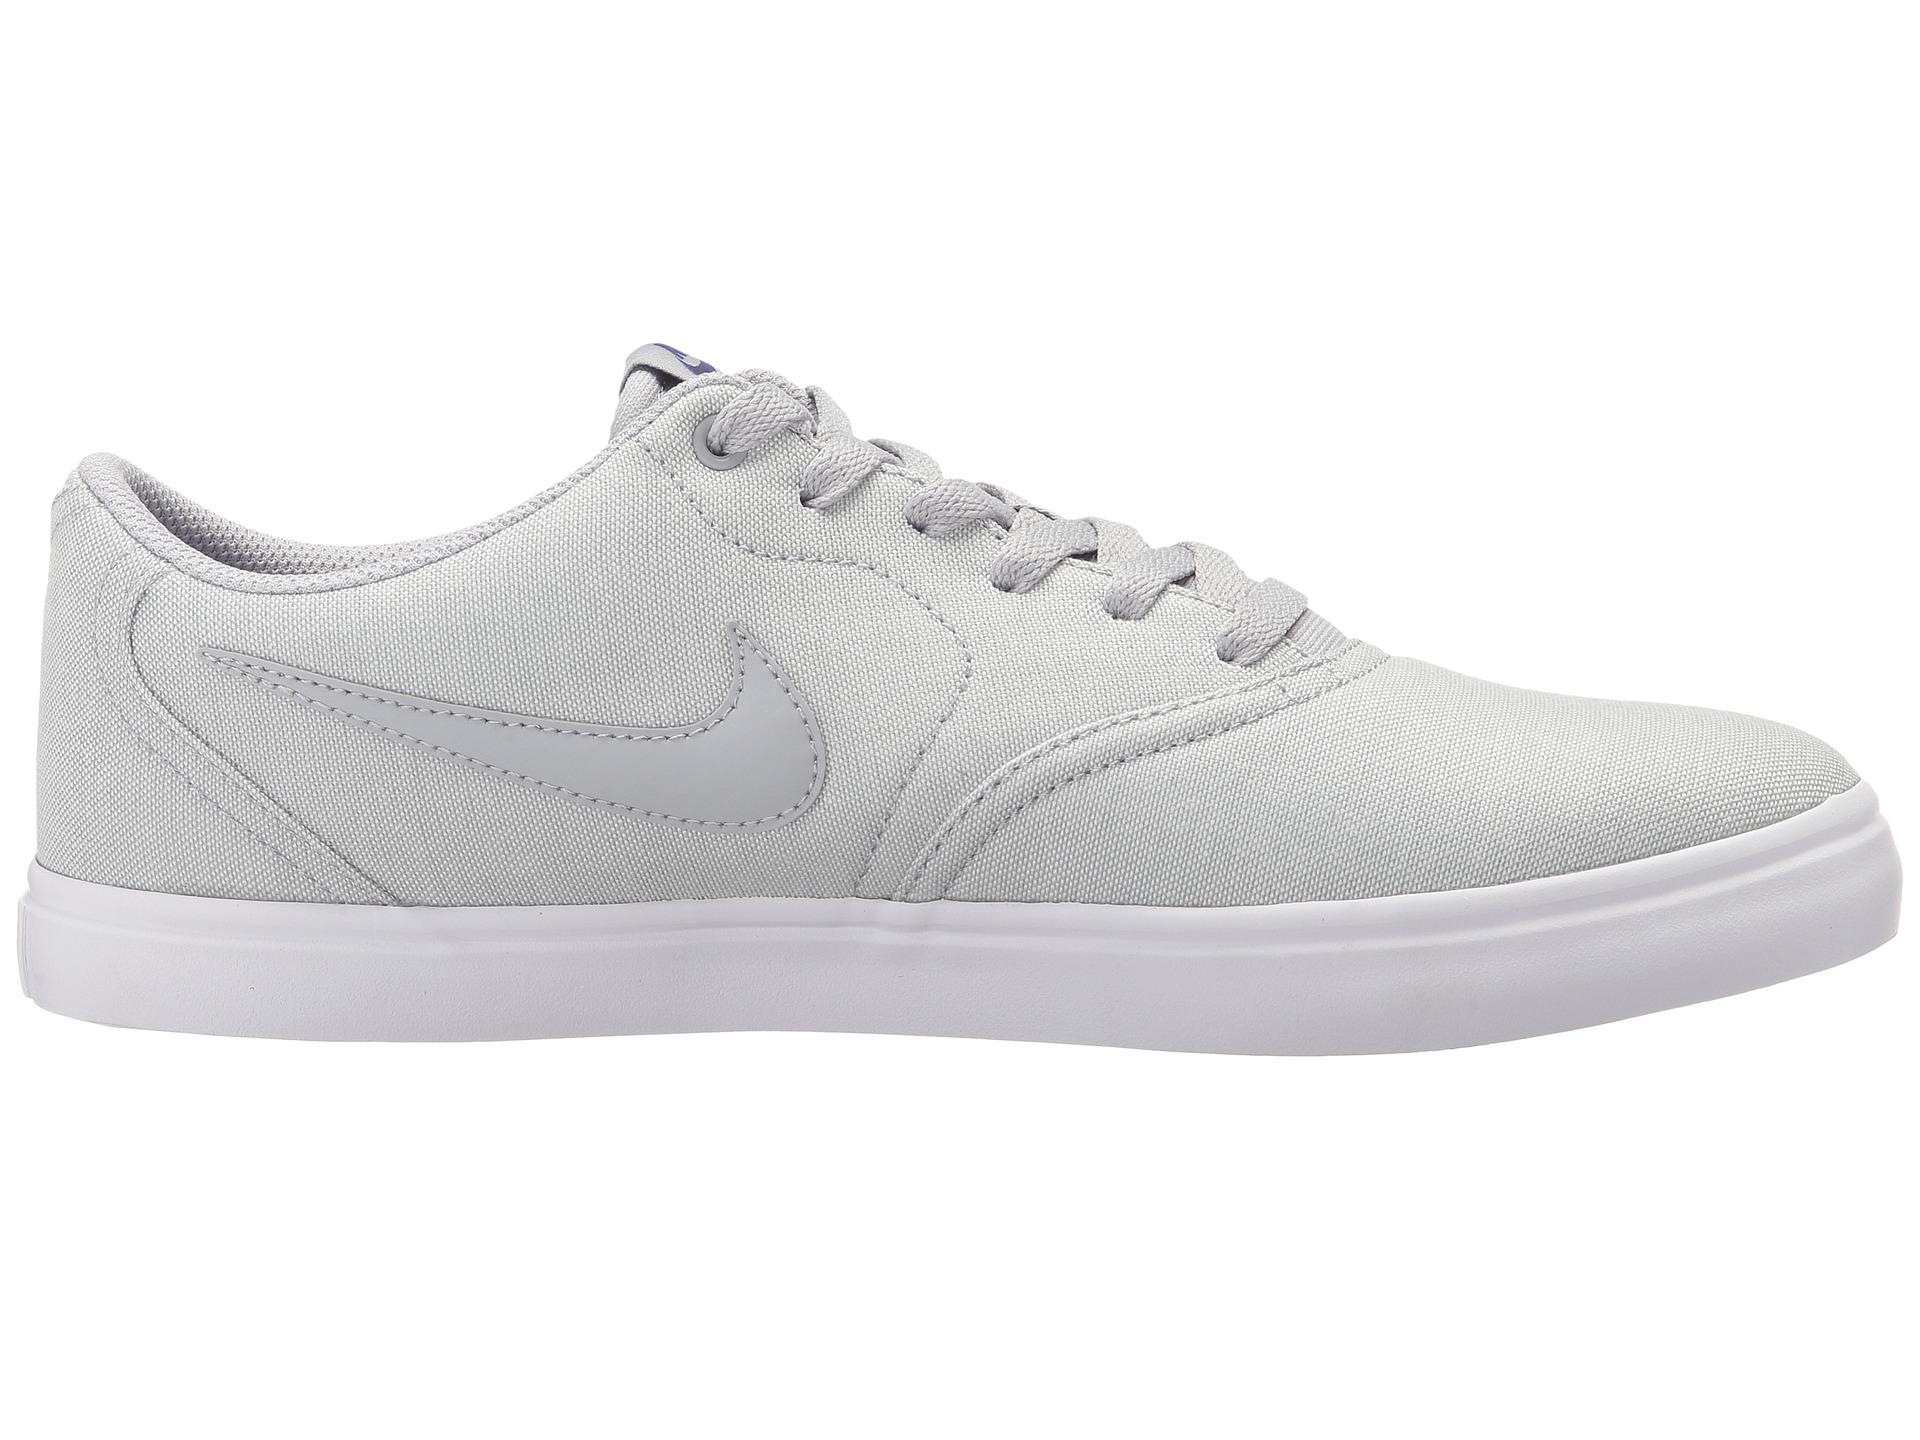 61312b8748b4b8 Nike Mens Shox NZ EU Running Shoes. 4.2 out of 5. air jordan 7 retro orion  blue